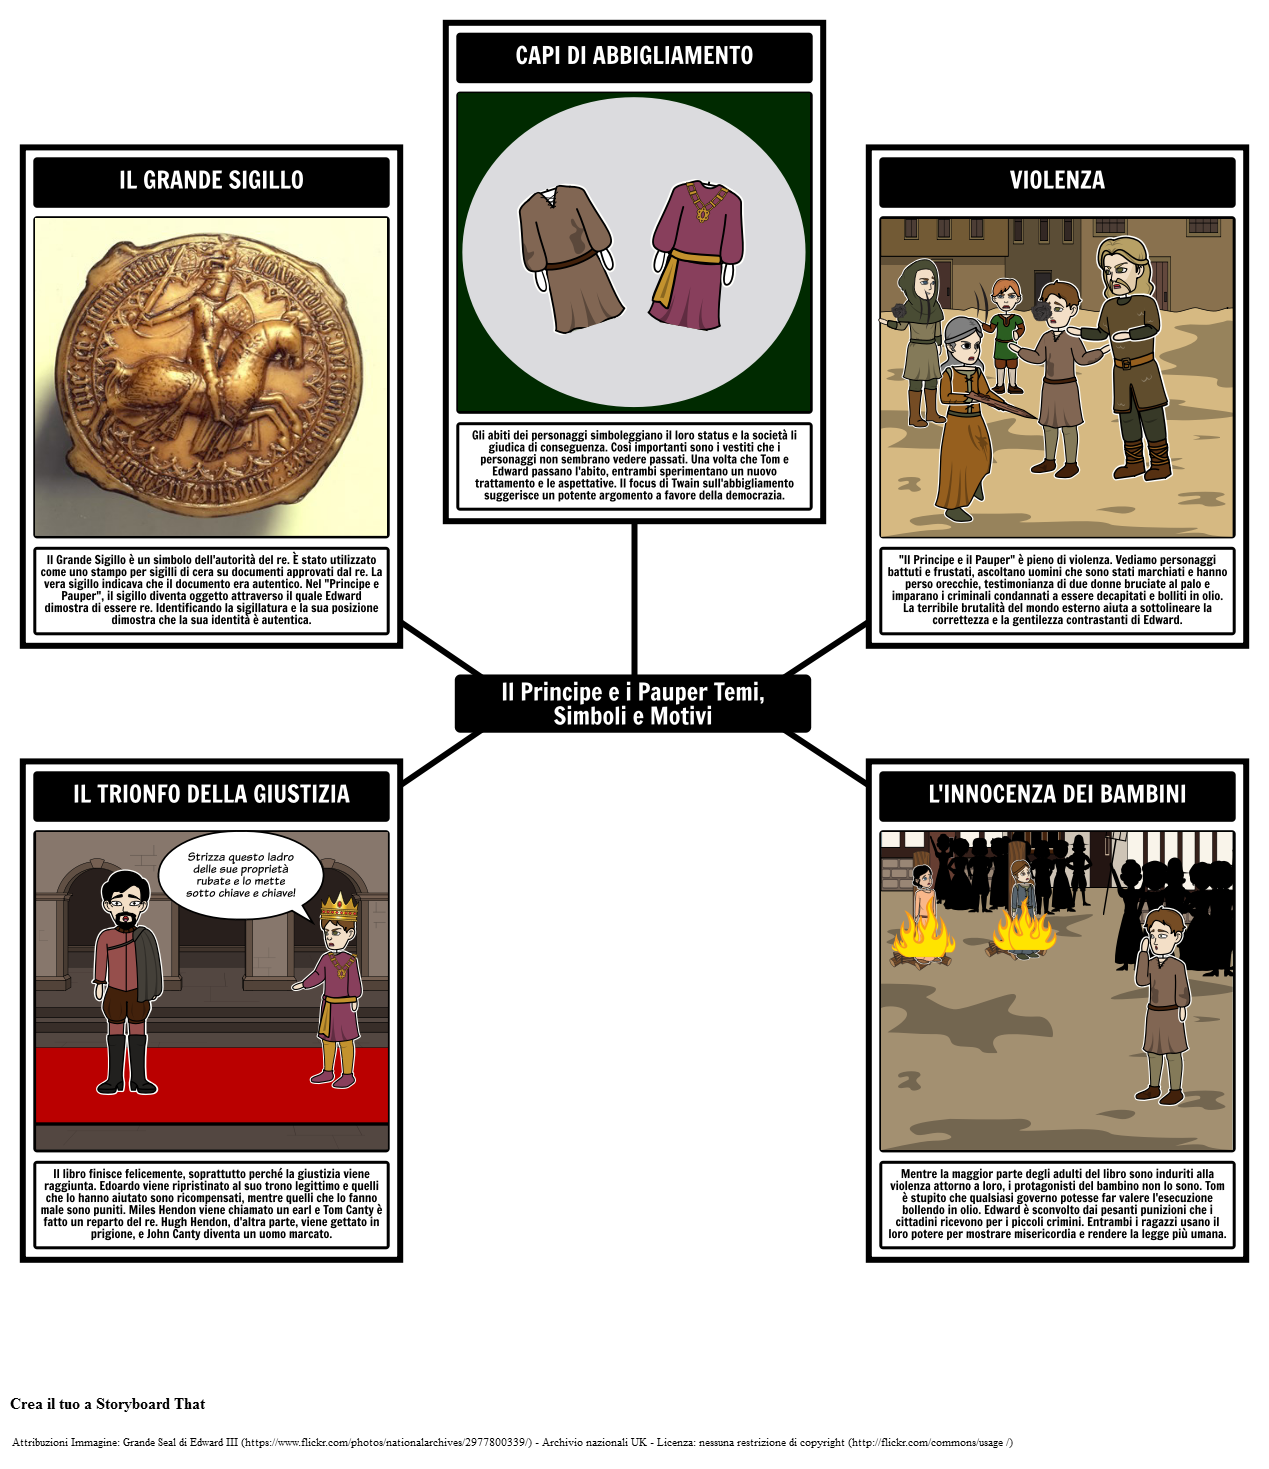 Il Principe e i Pauper Temi, Motivi e Simboli